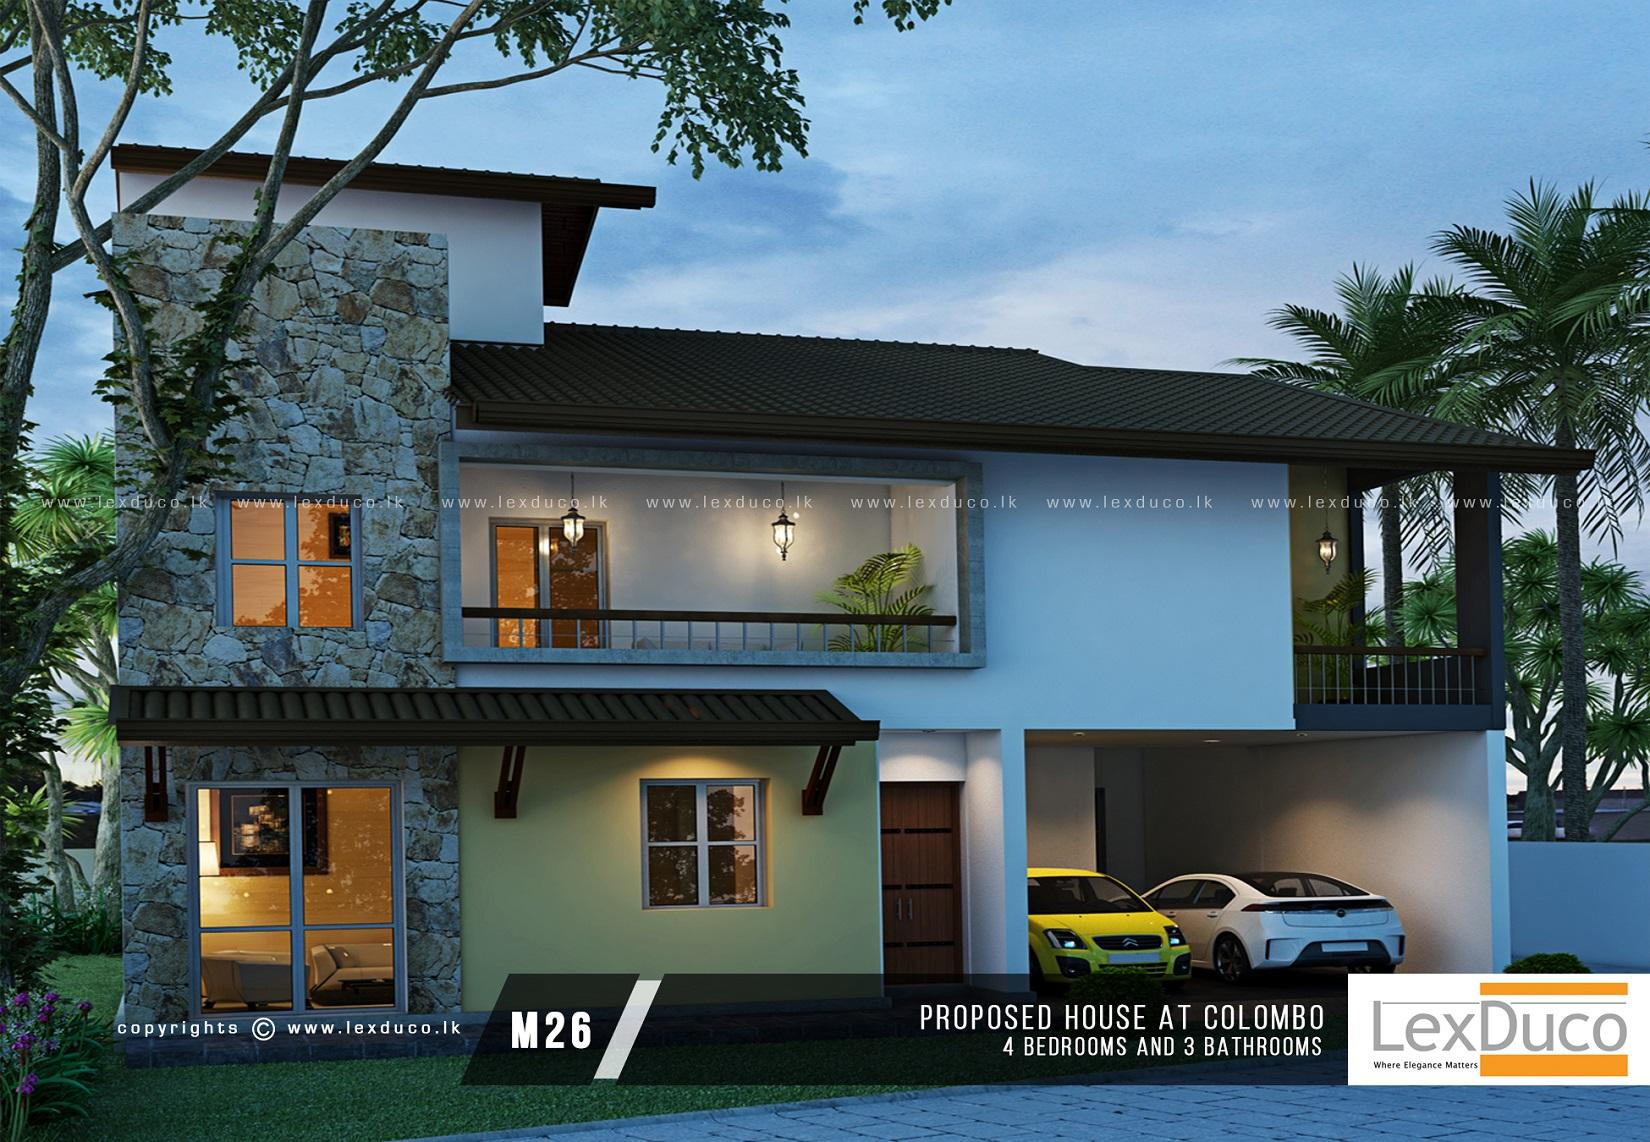 Home Design Ideas Construction: #1 House Builders In Sri Lanka